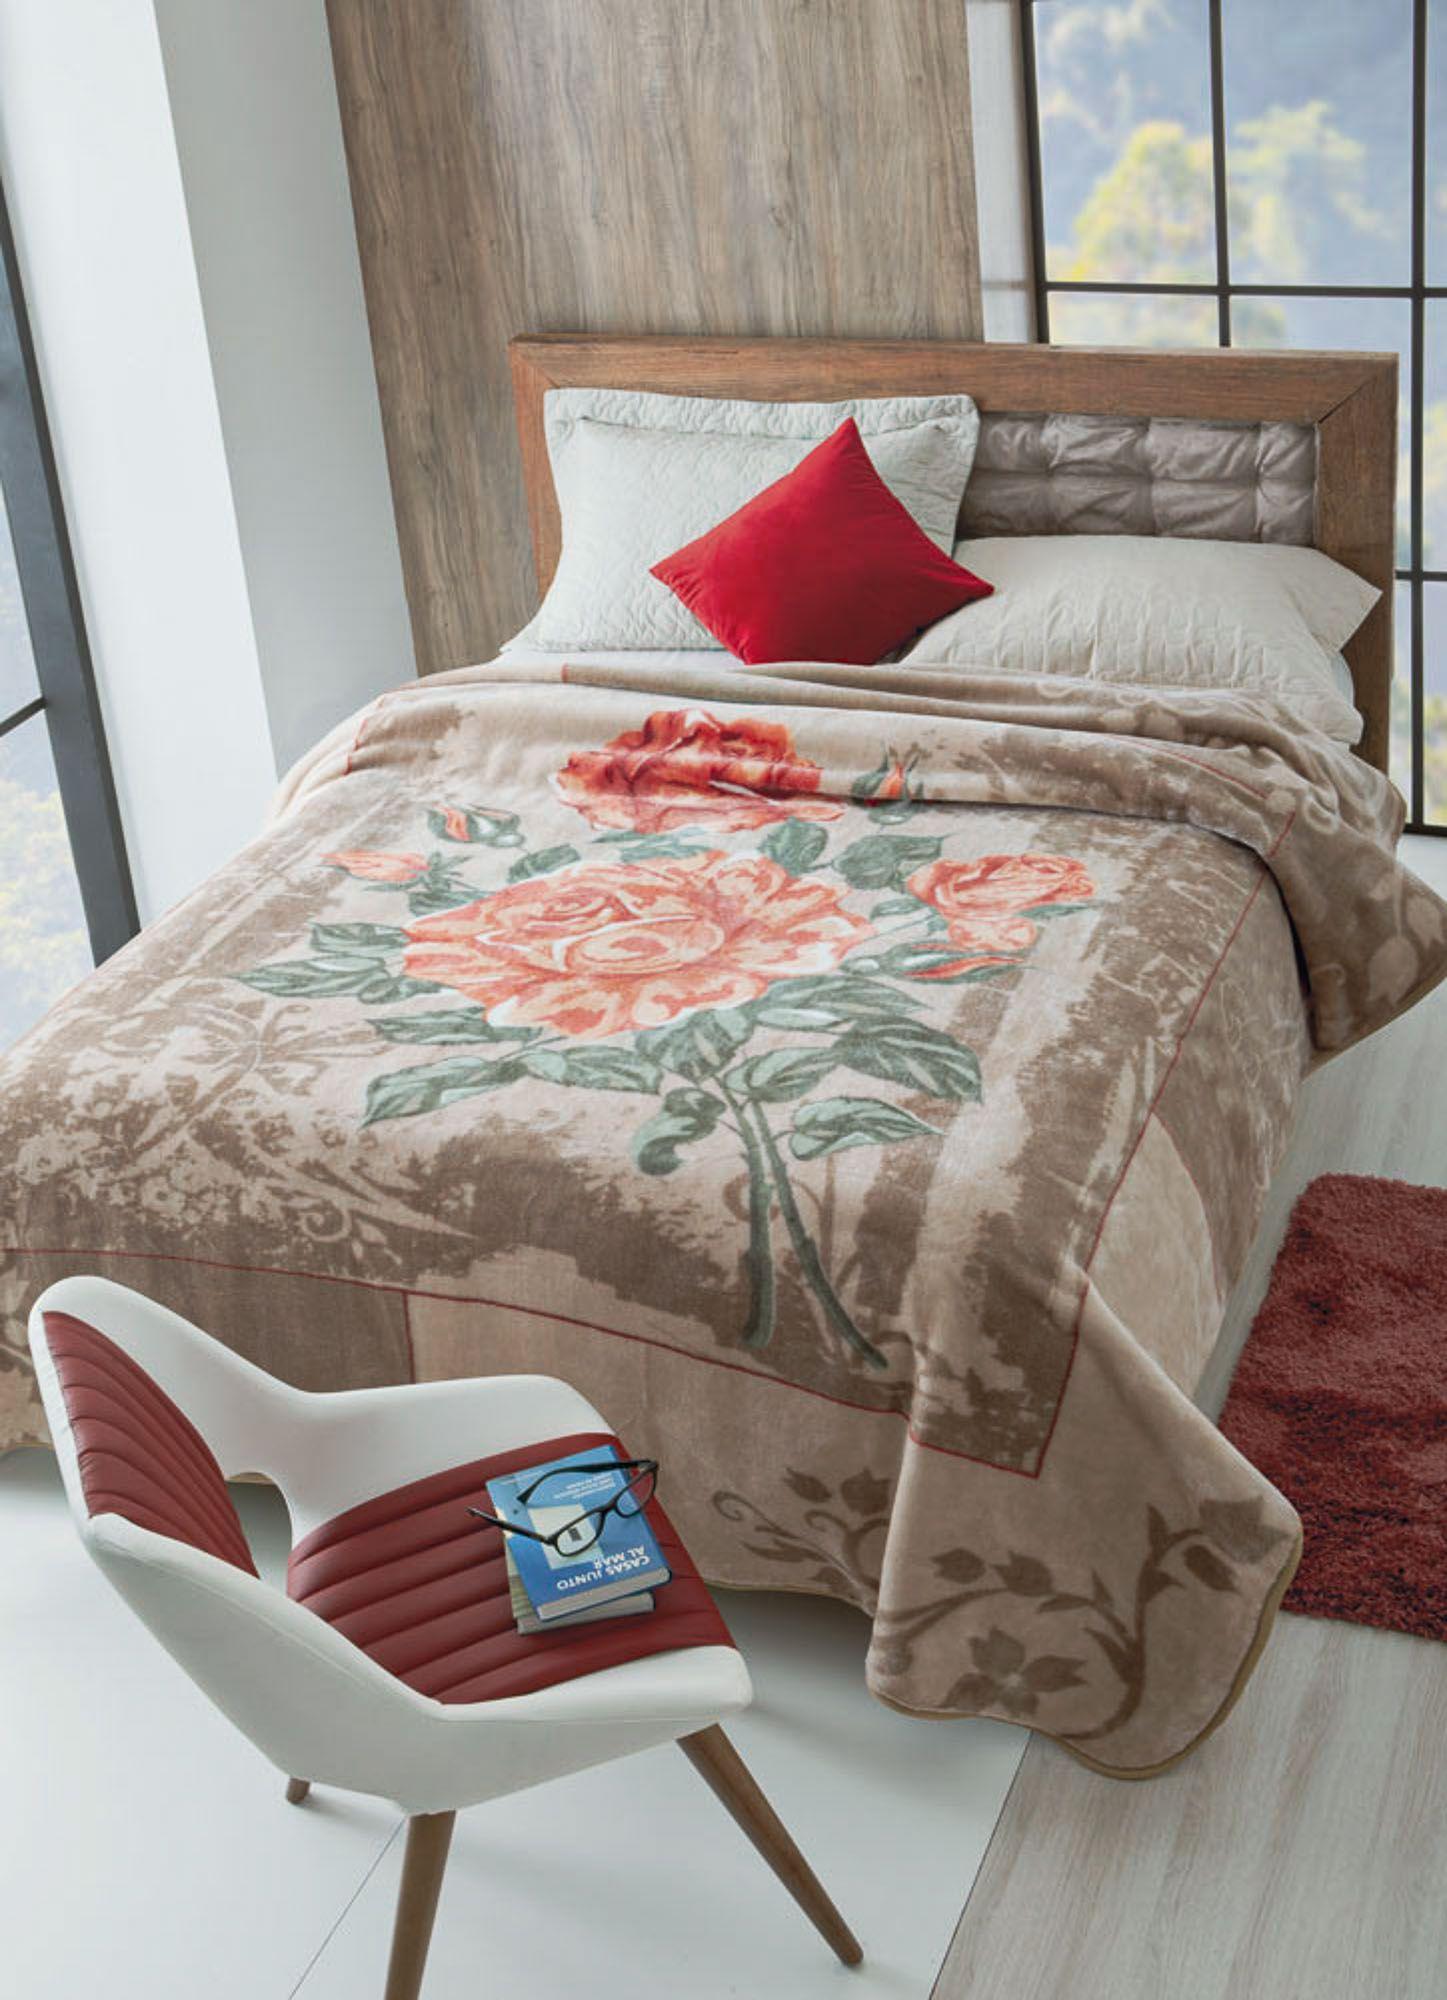 Cobertor Jolitex Raschel Casal 1,80x2,20m Elegance